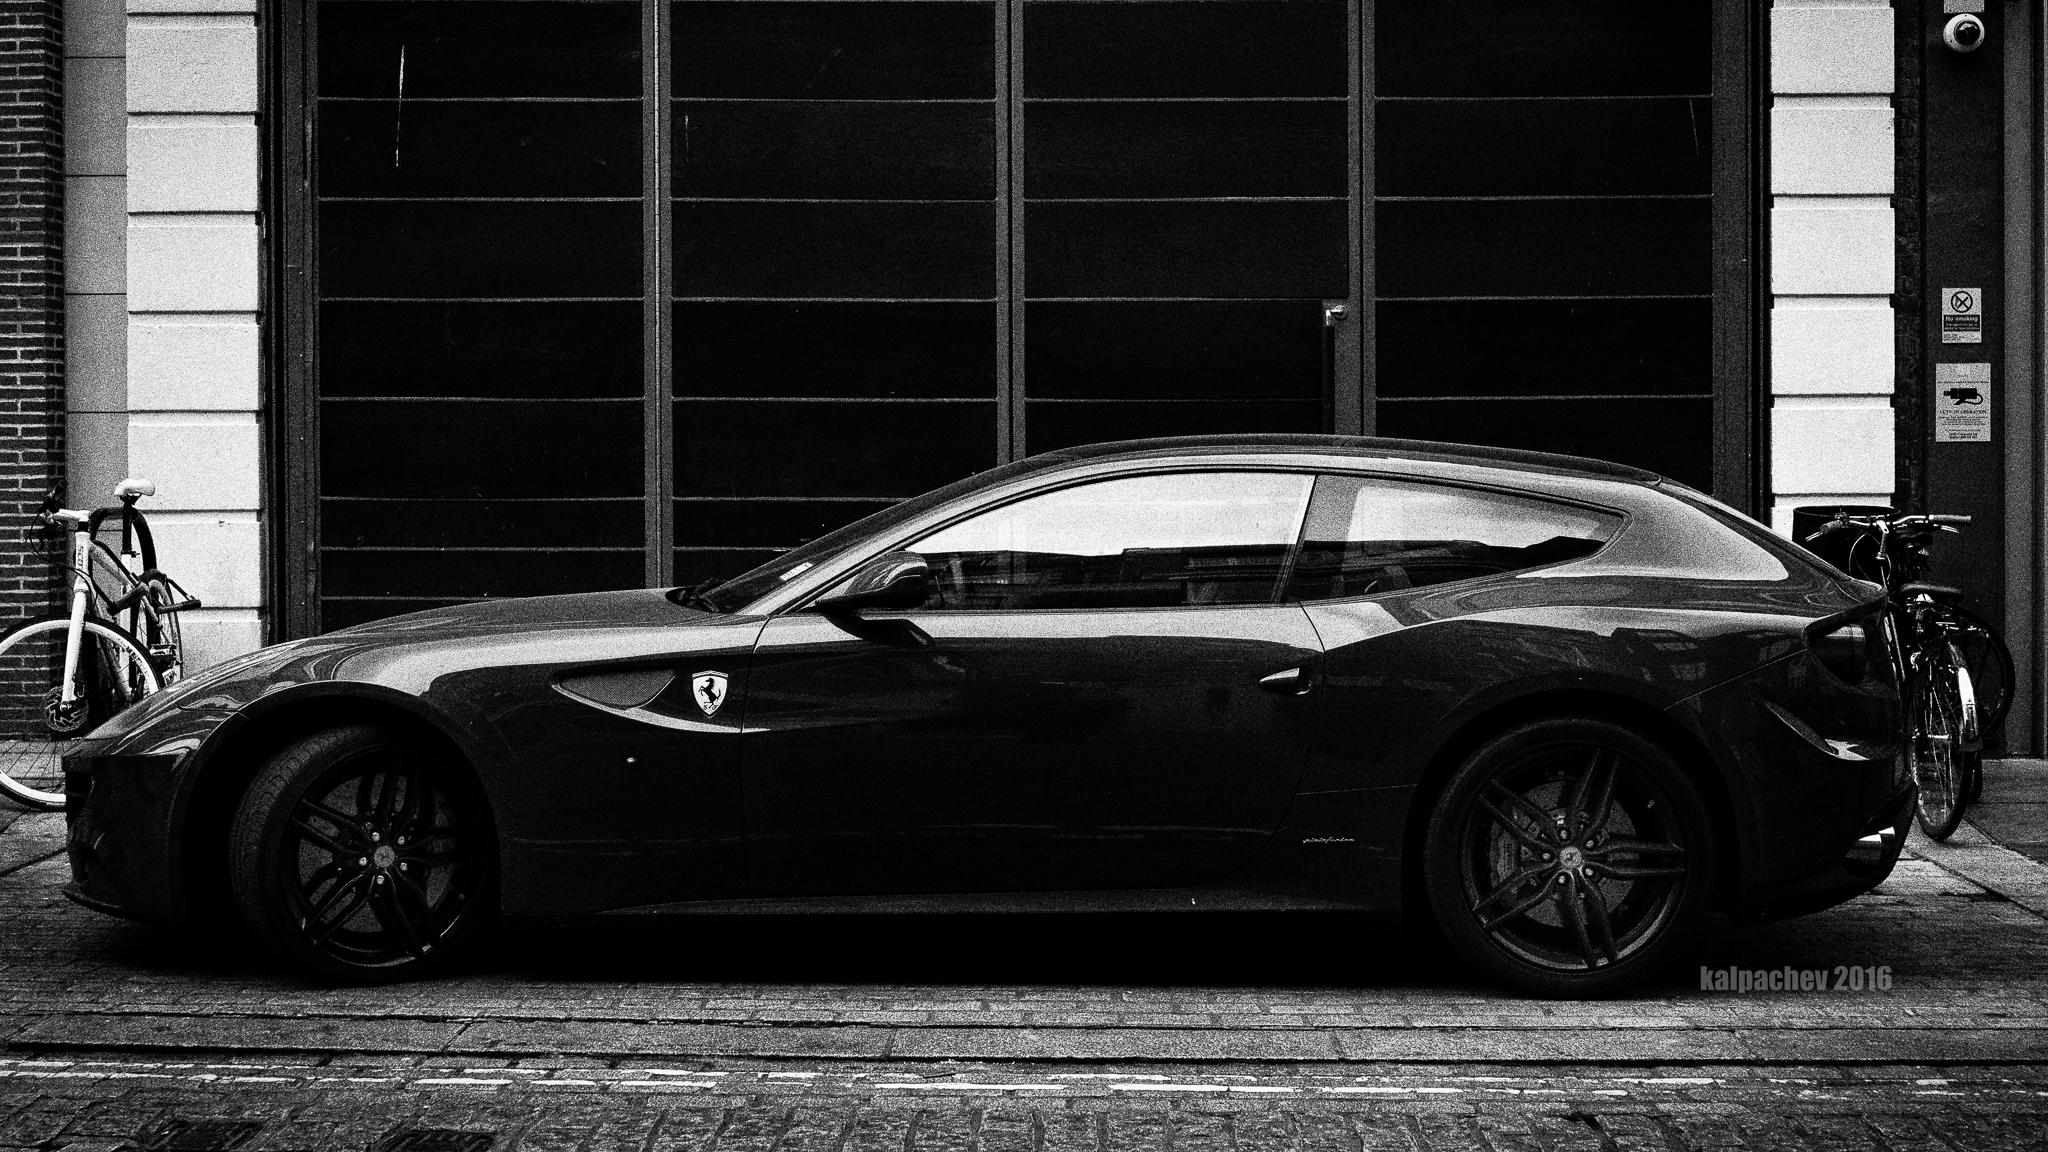 Ferrari in Soho, London